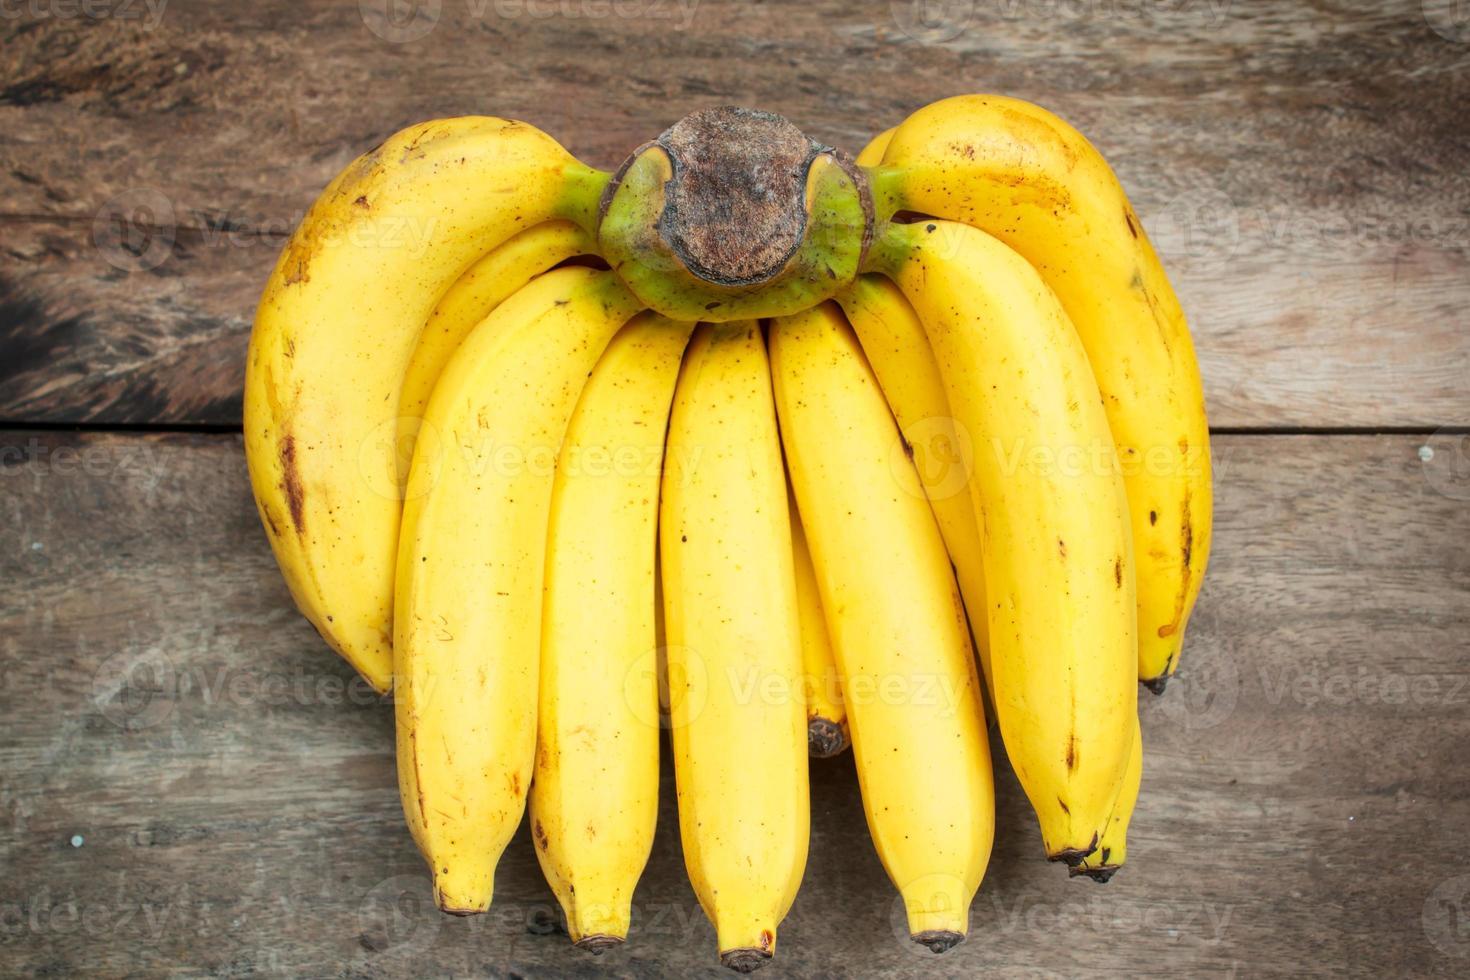 mazzo di banane. foto